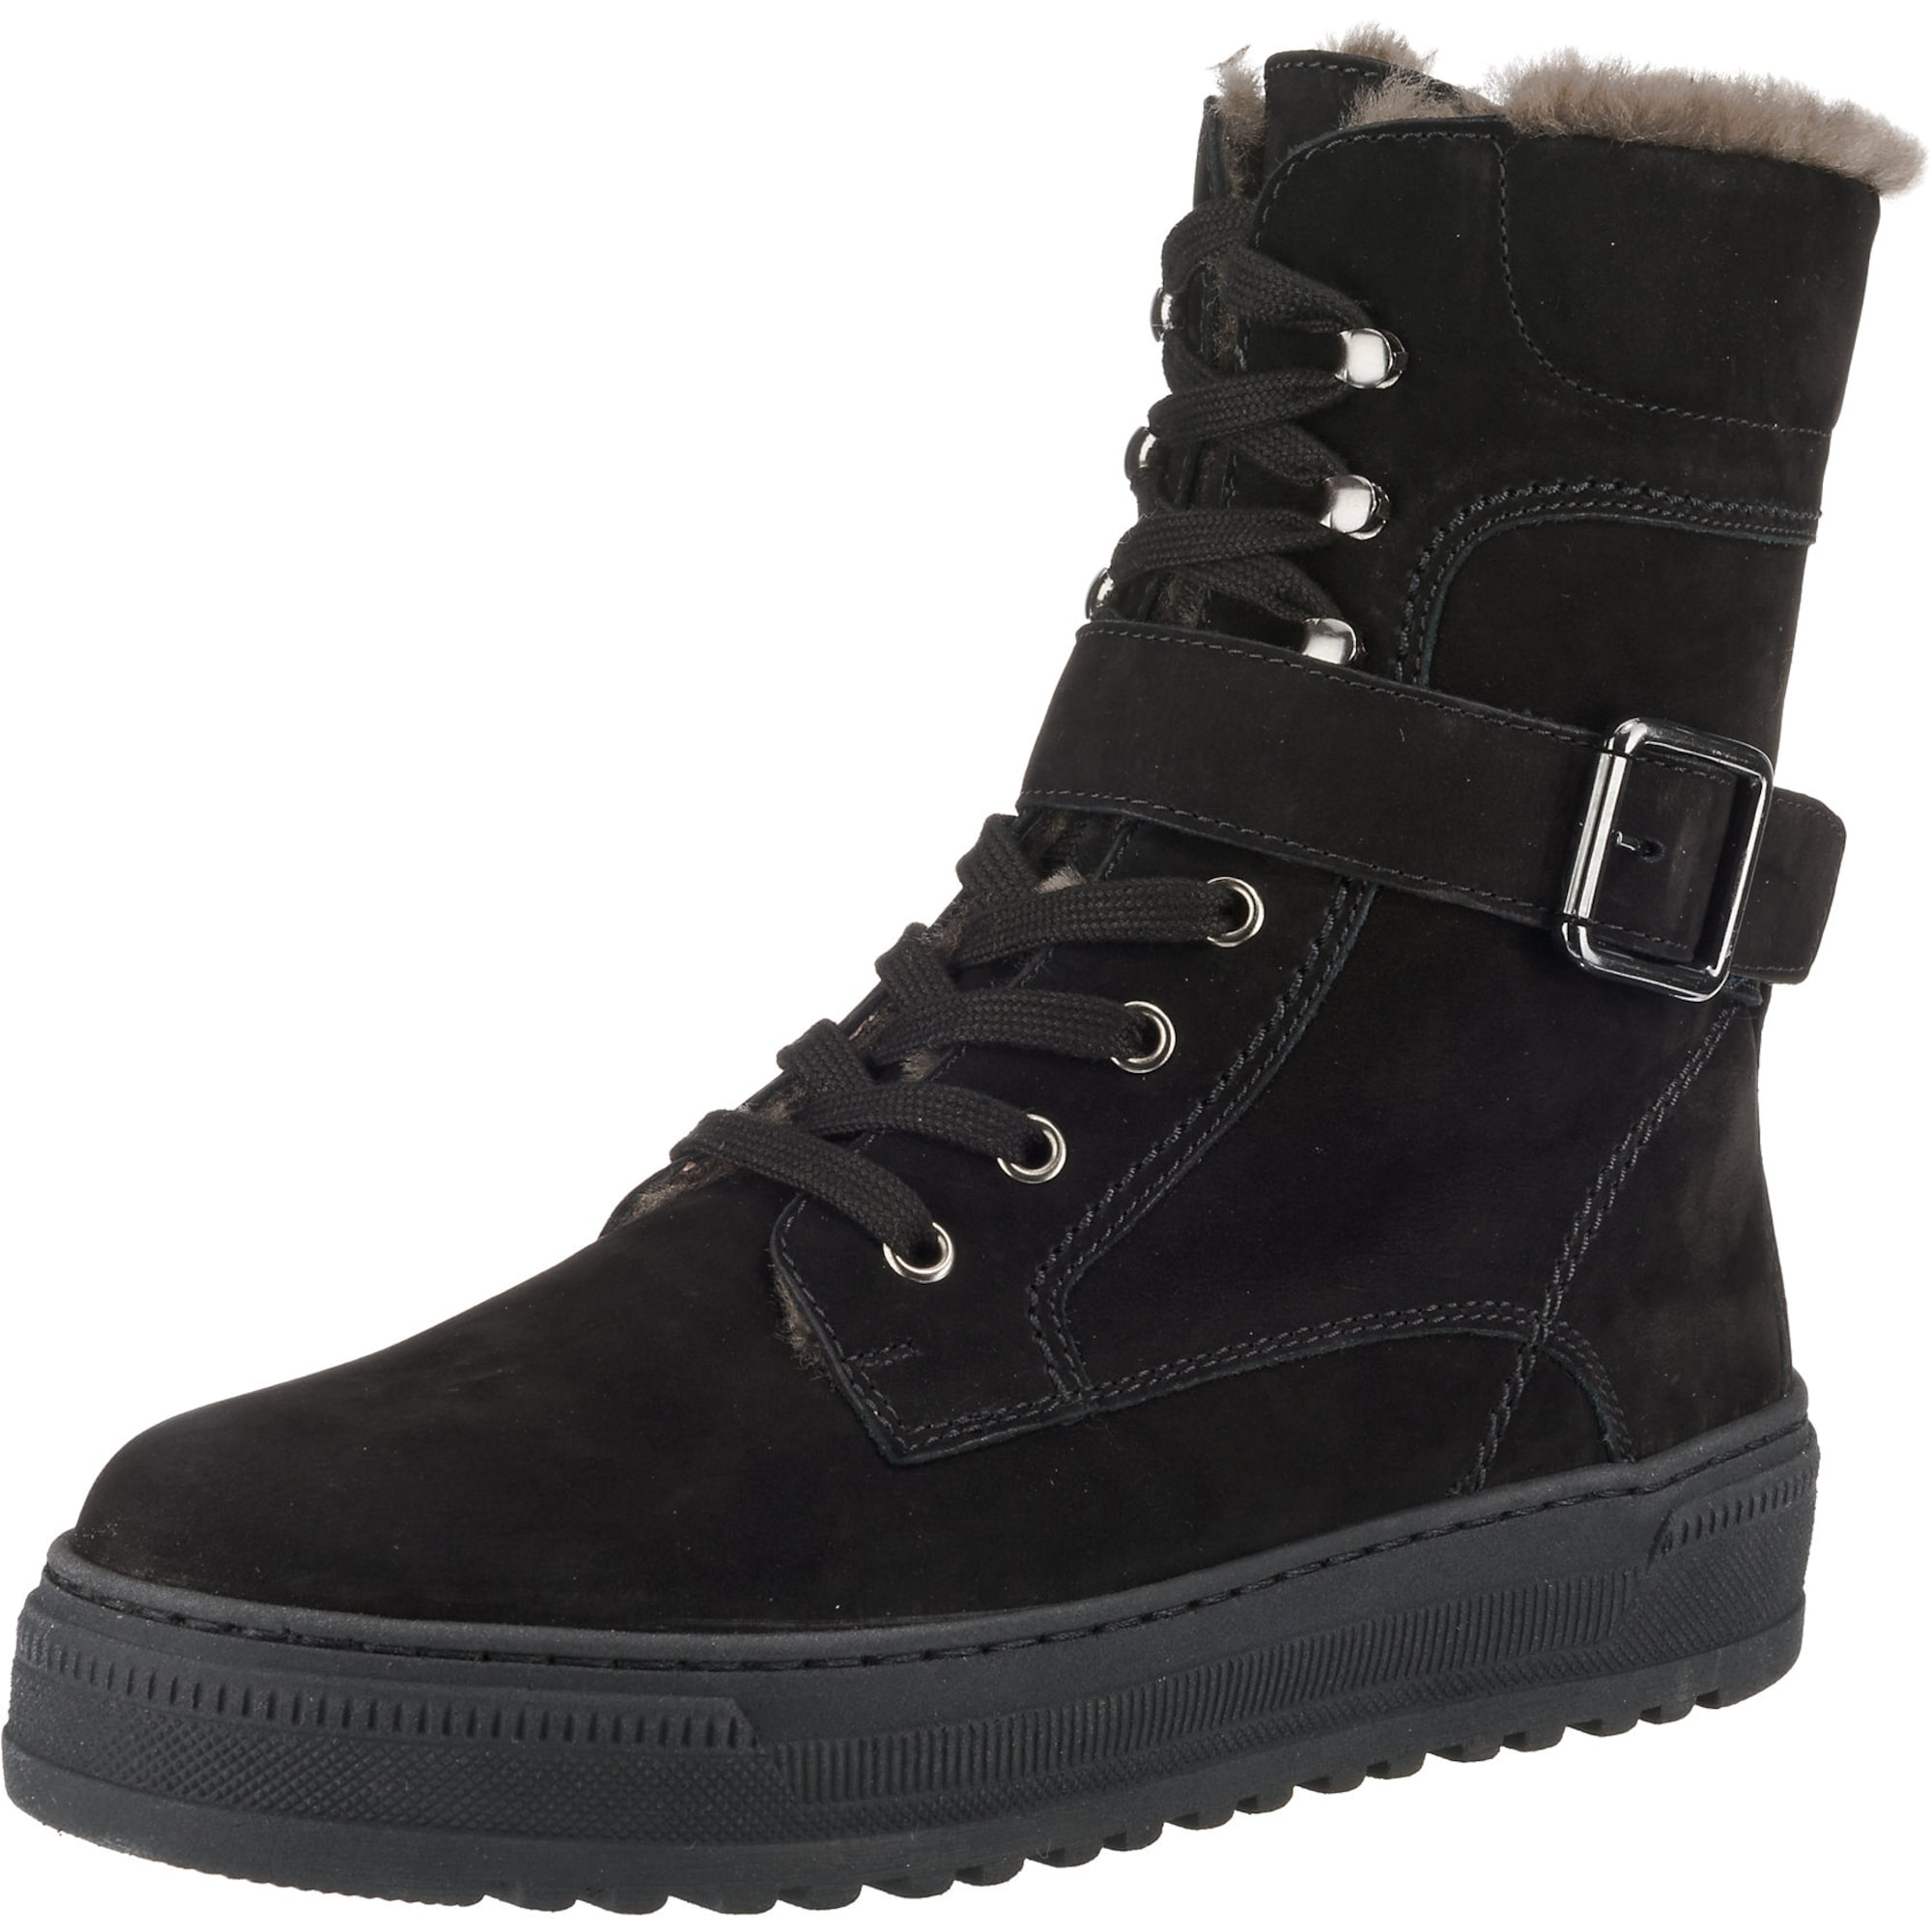 Winterstiefeletten   Schuhe > Stiefeletten > Winterstiefeletten   Schwarz   Gabor